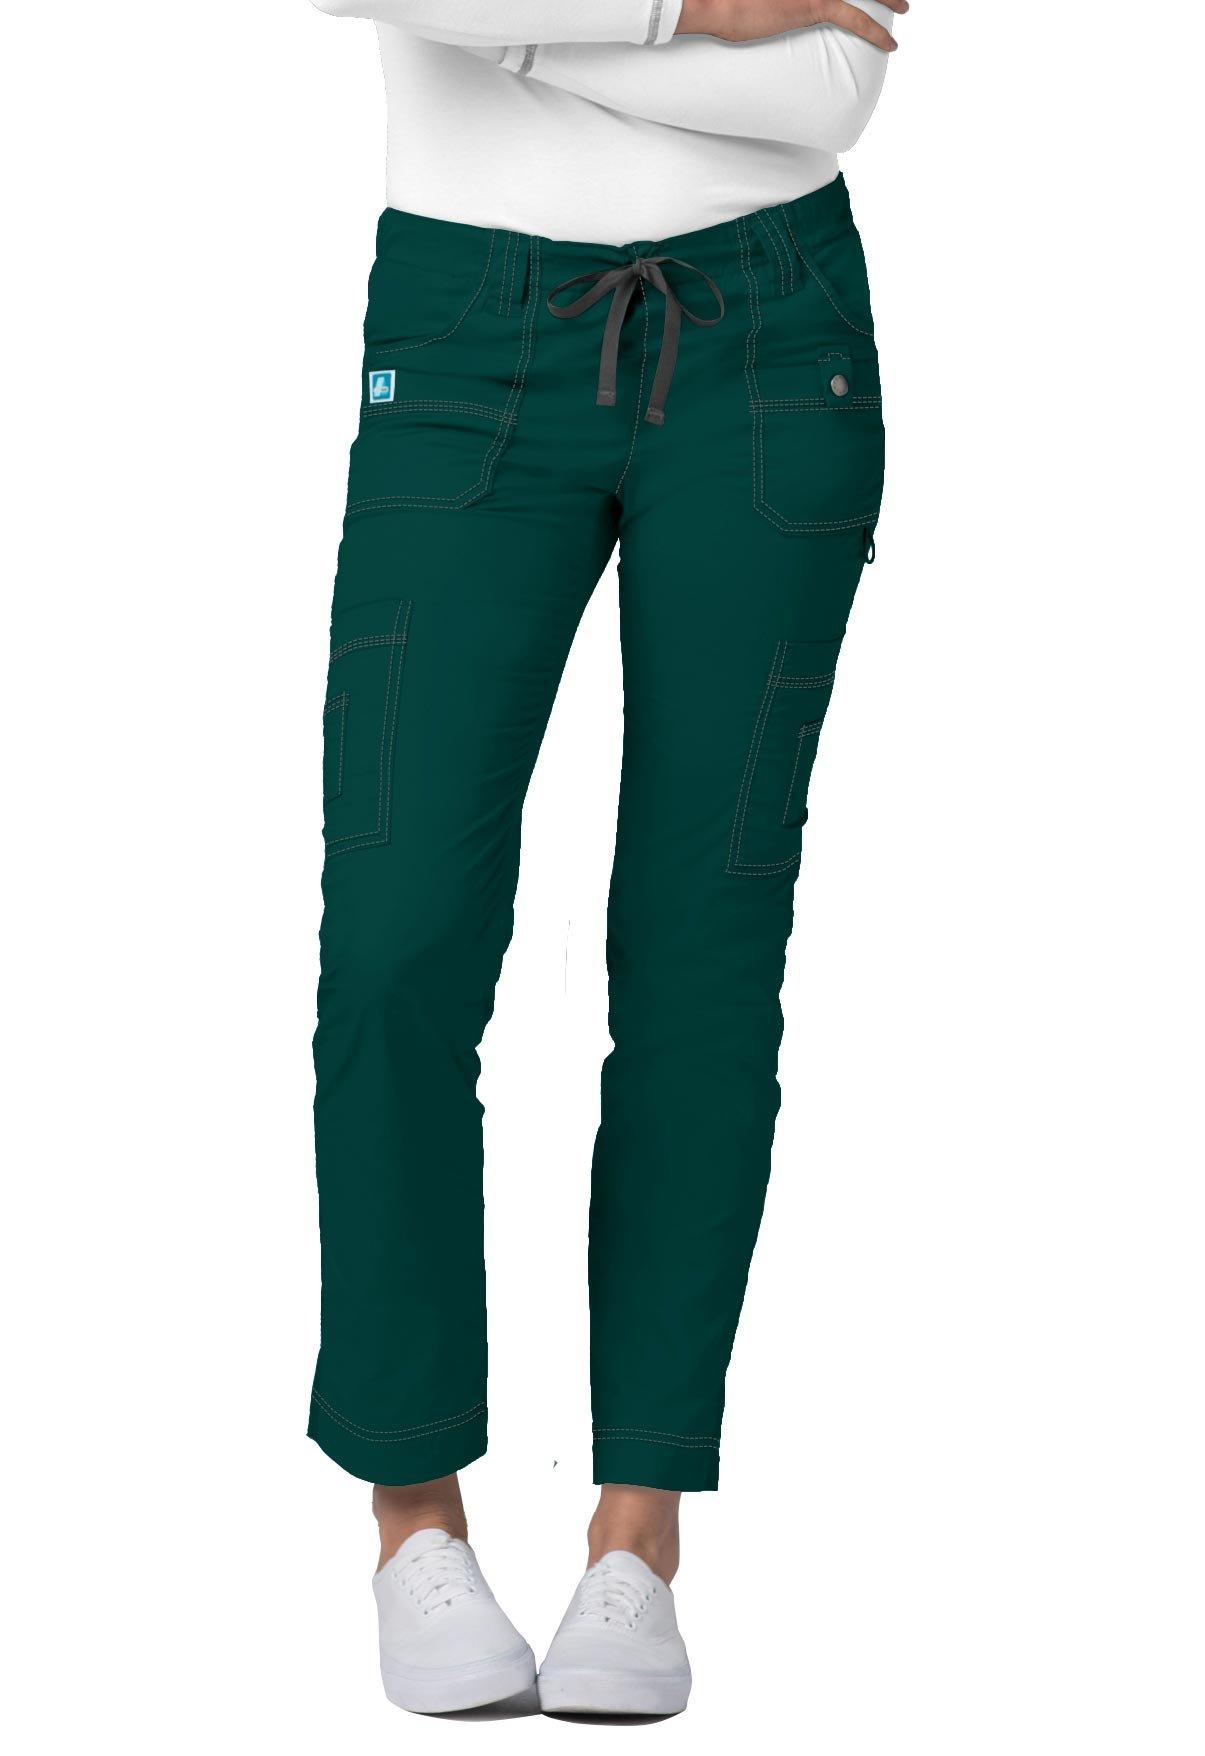 Adar Pop-Stretch Jr. Fit Low-Rise 11-Pocket Slim Cargo Pants - 3108 - Hunter Green - XXS